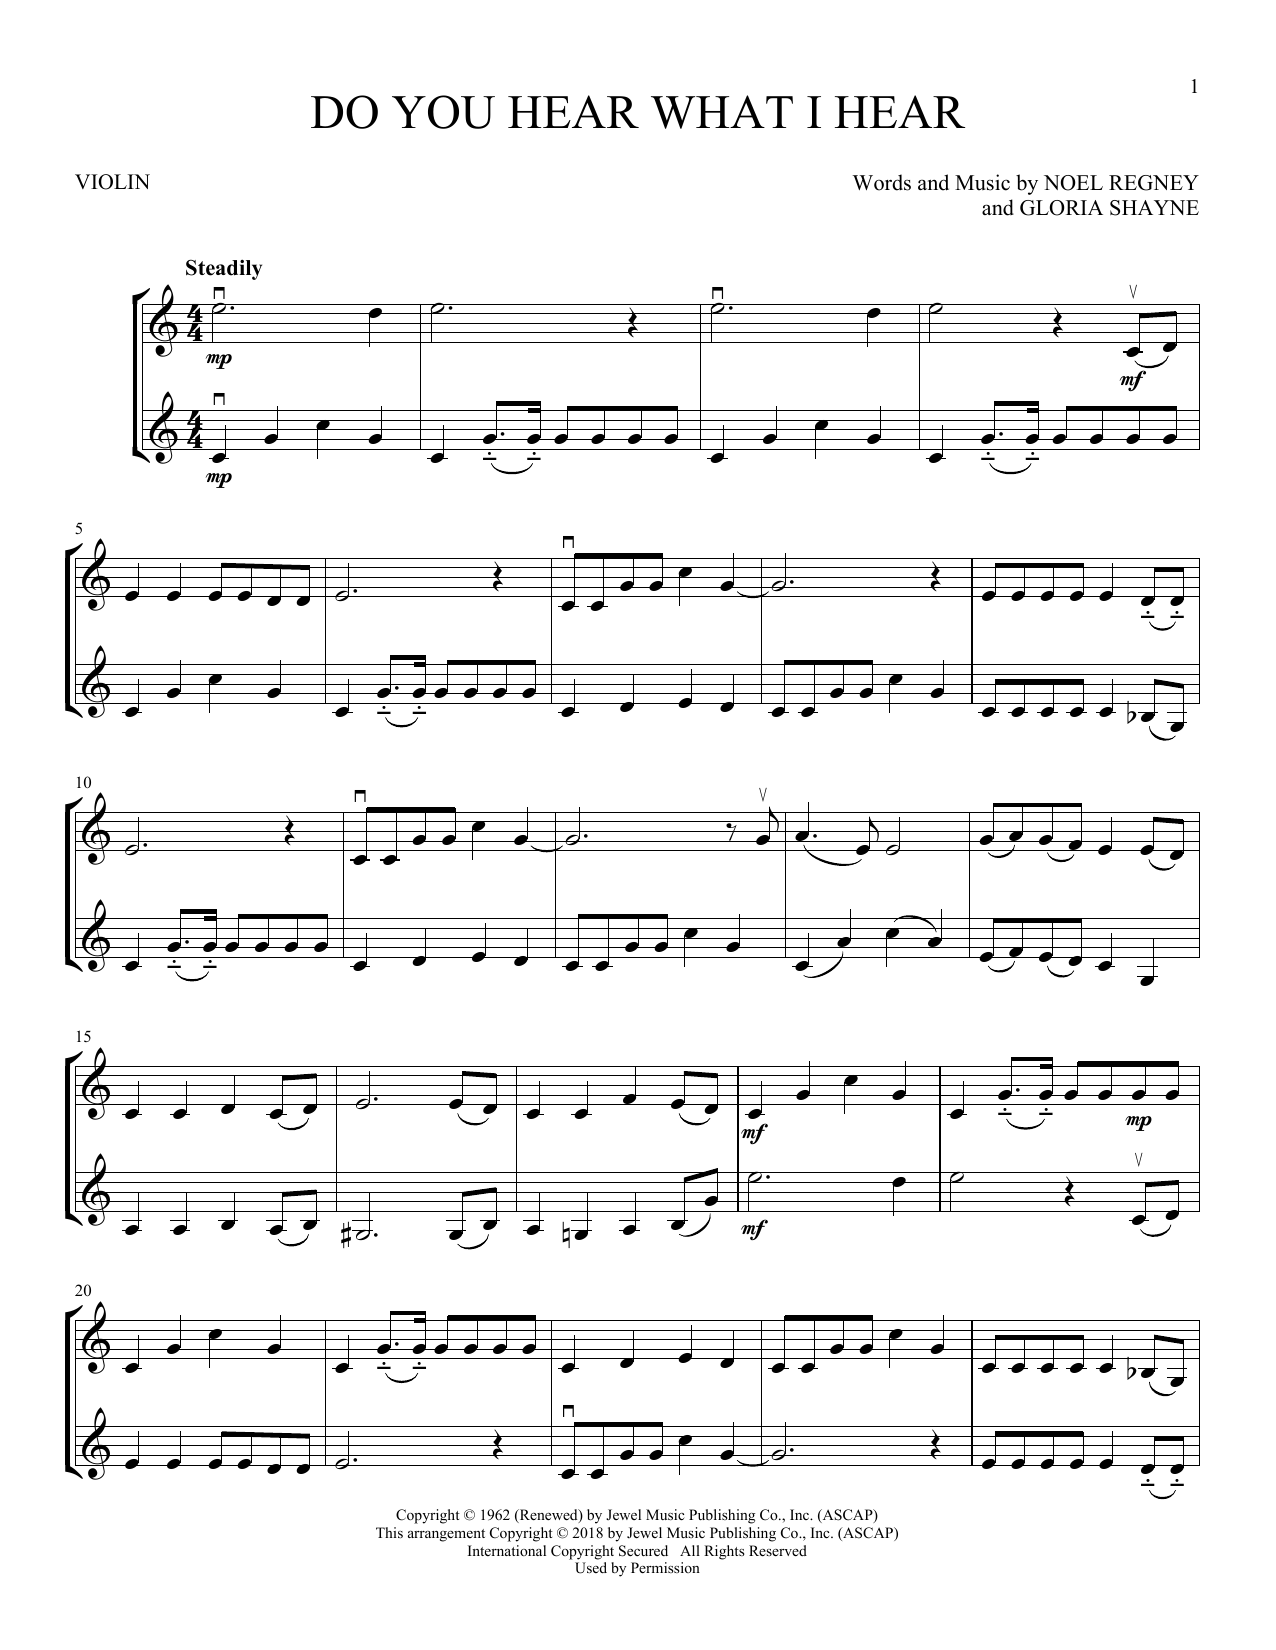 Do You Hear What I Hear (Violin Duet)